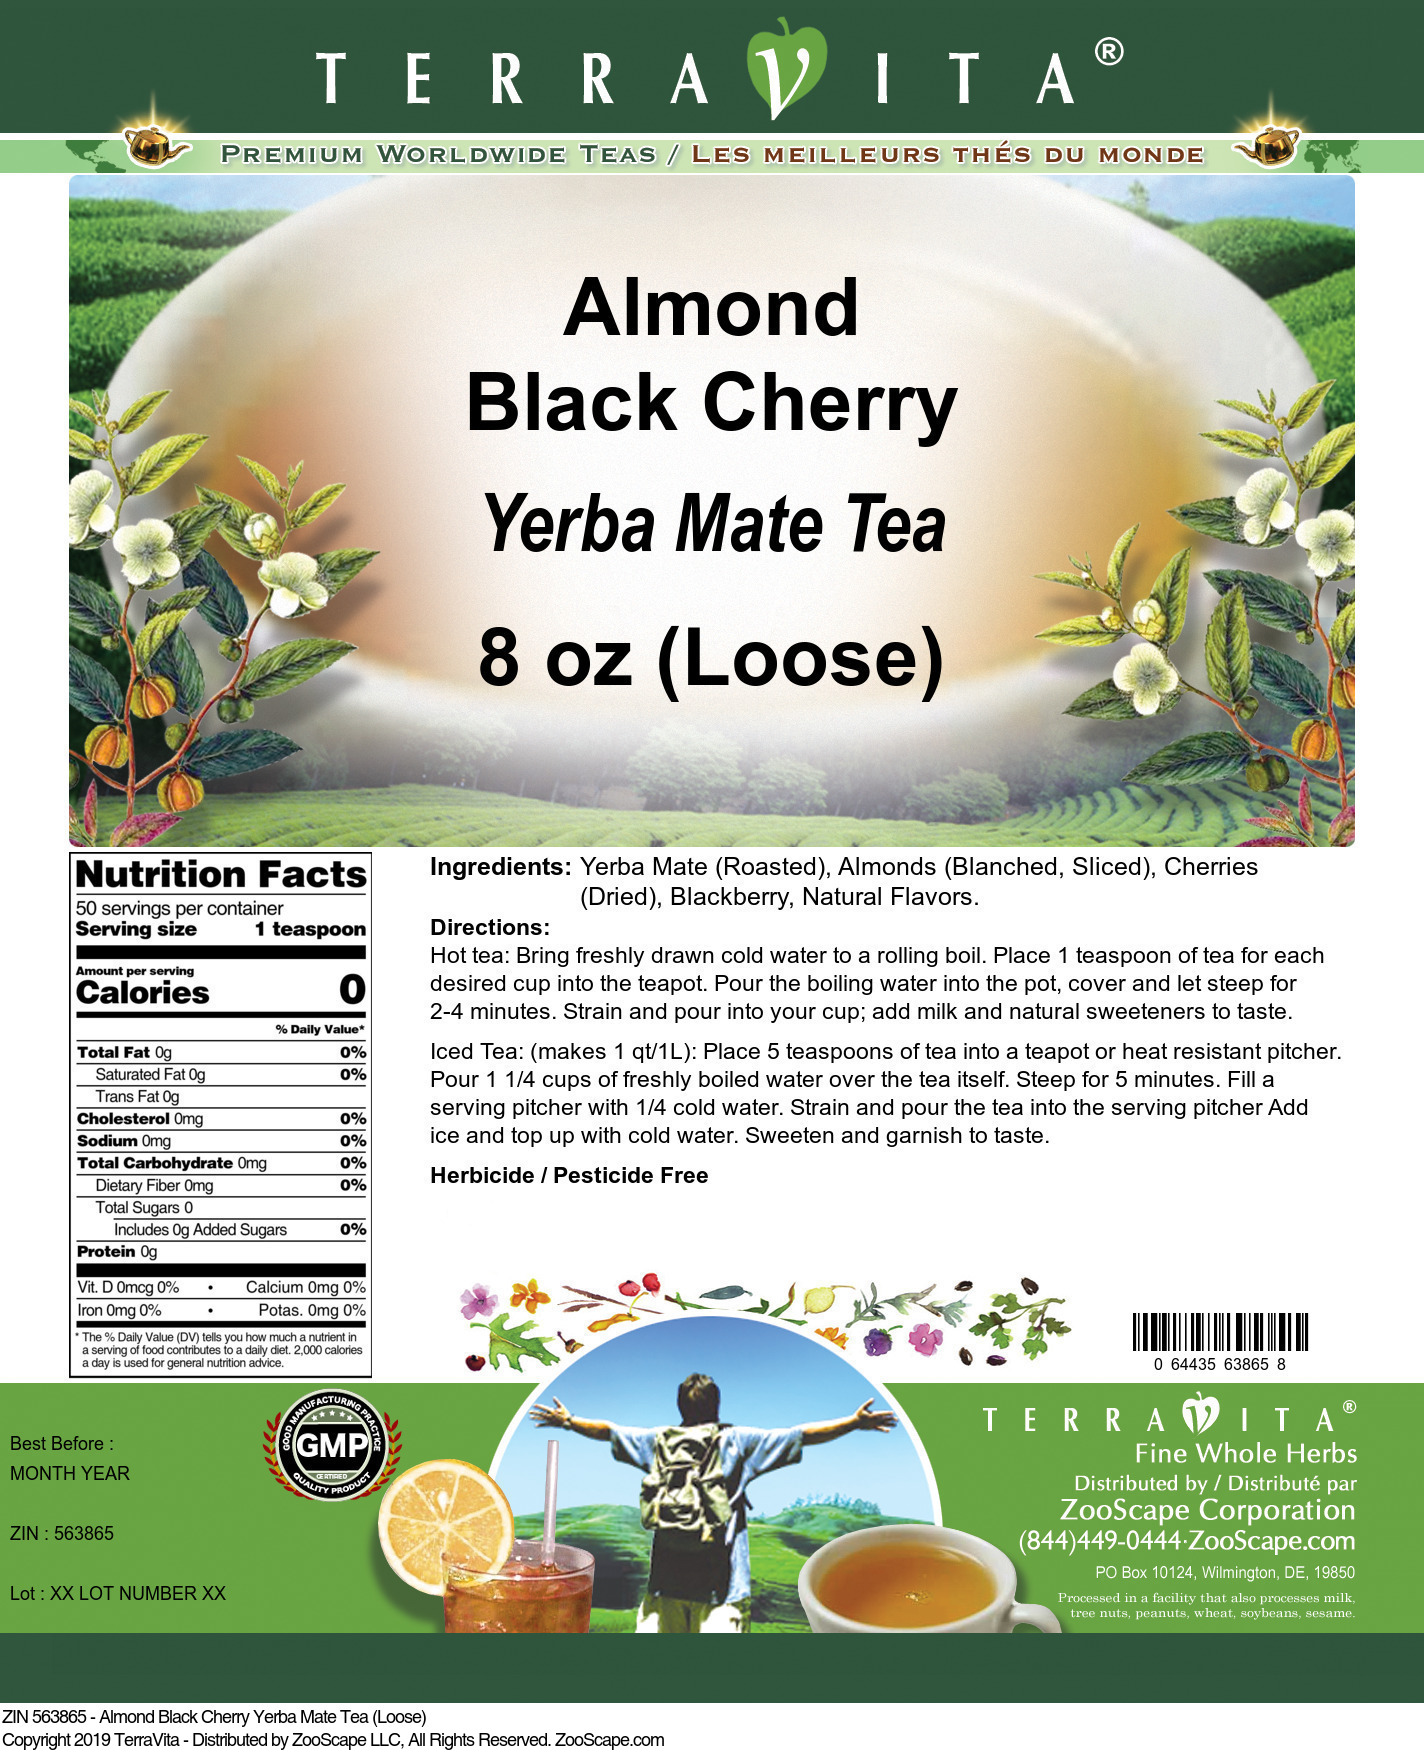 Almond Black Cherry Yerba Mate